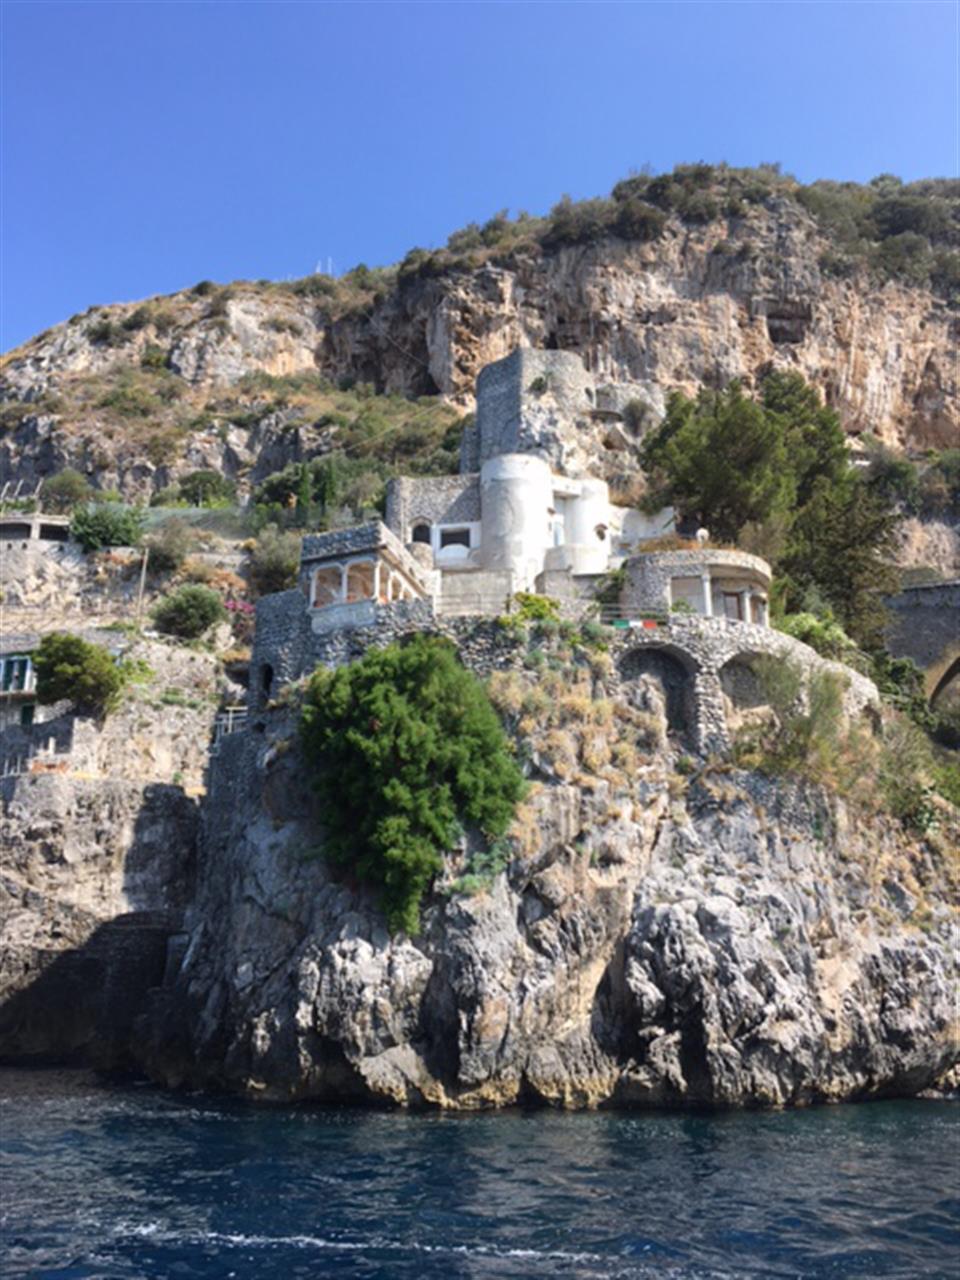 #leadingrelocal  #Amalfi #Italy